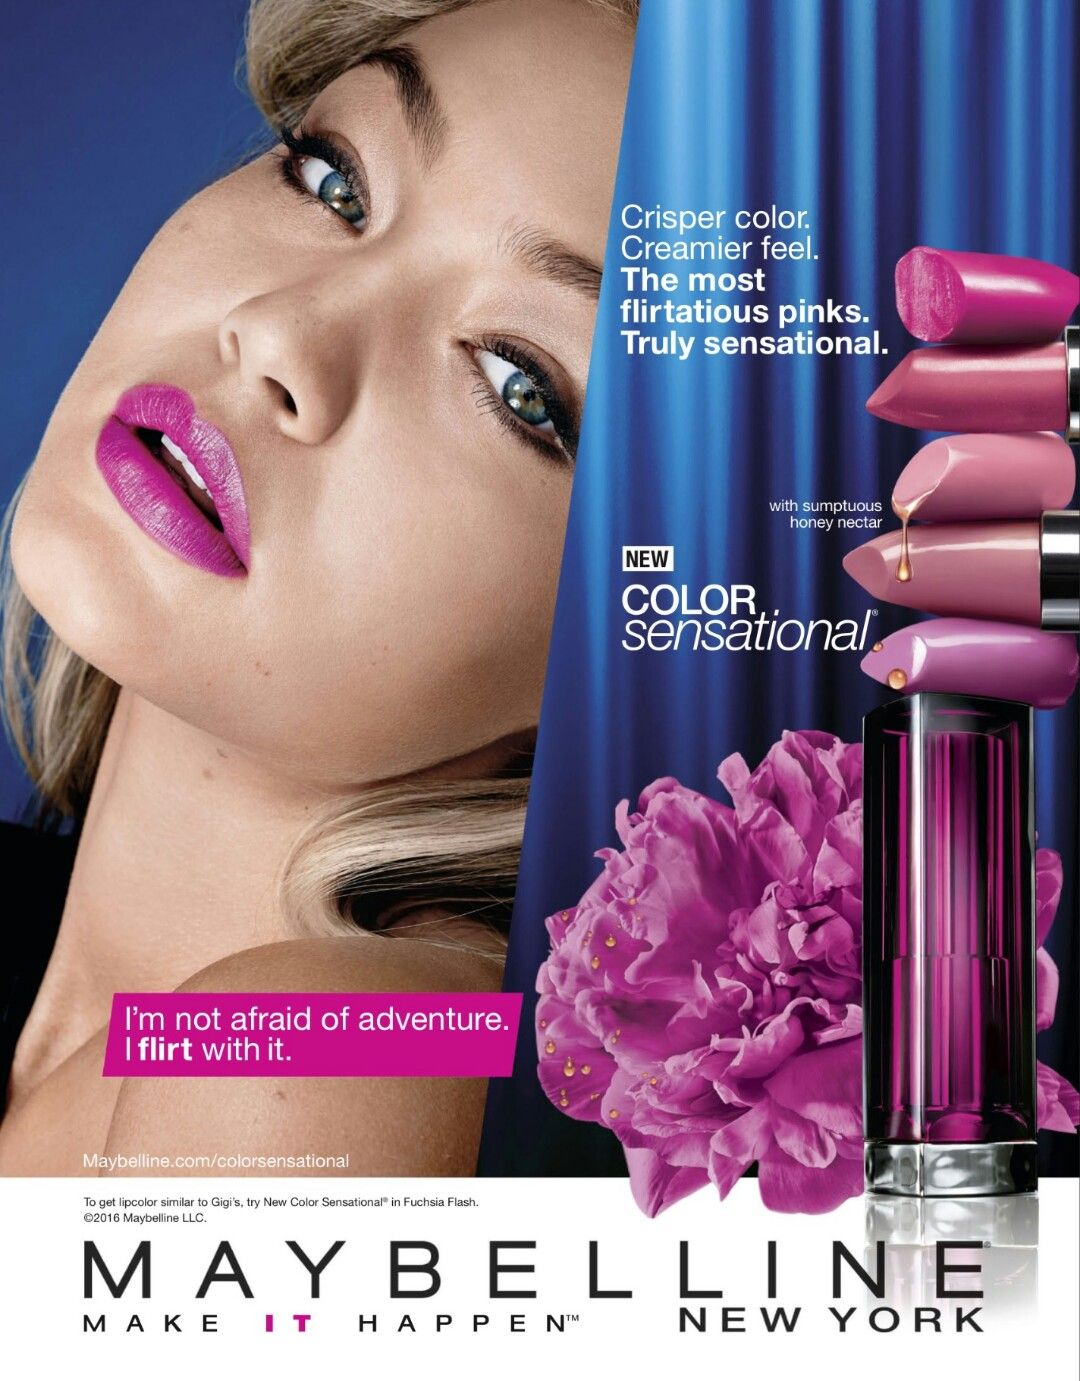 Maybelline Color Sensational Advertising Wiring Diagrams Electrical And Lighting 39n39 Type Plugs Sockets Gigi Hadid New York Cosmetics Rh Pinterest Com Lipstick Advertisement Shades